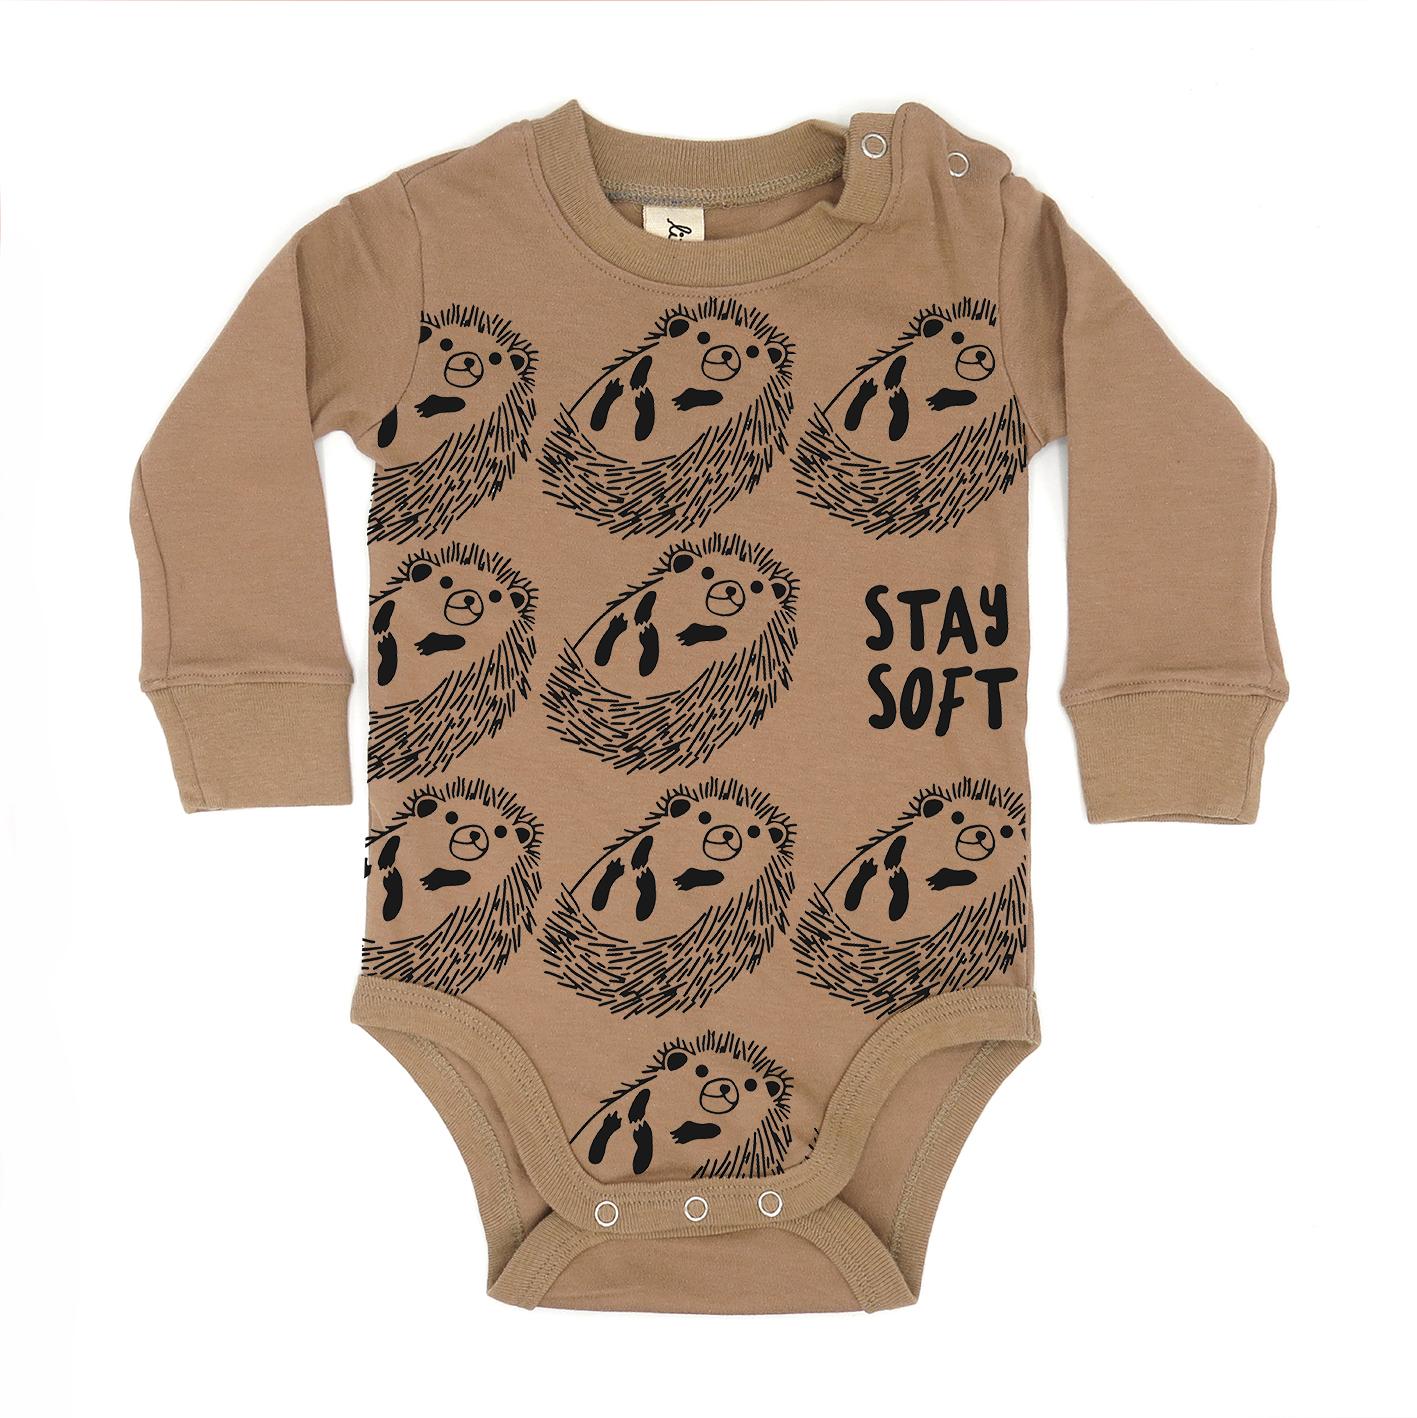 BABY 0-18M [B] LP0145 STAY SOFT ONESIE